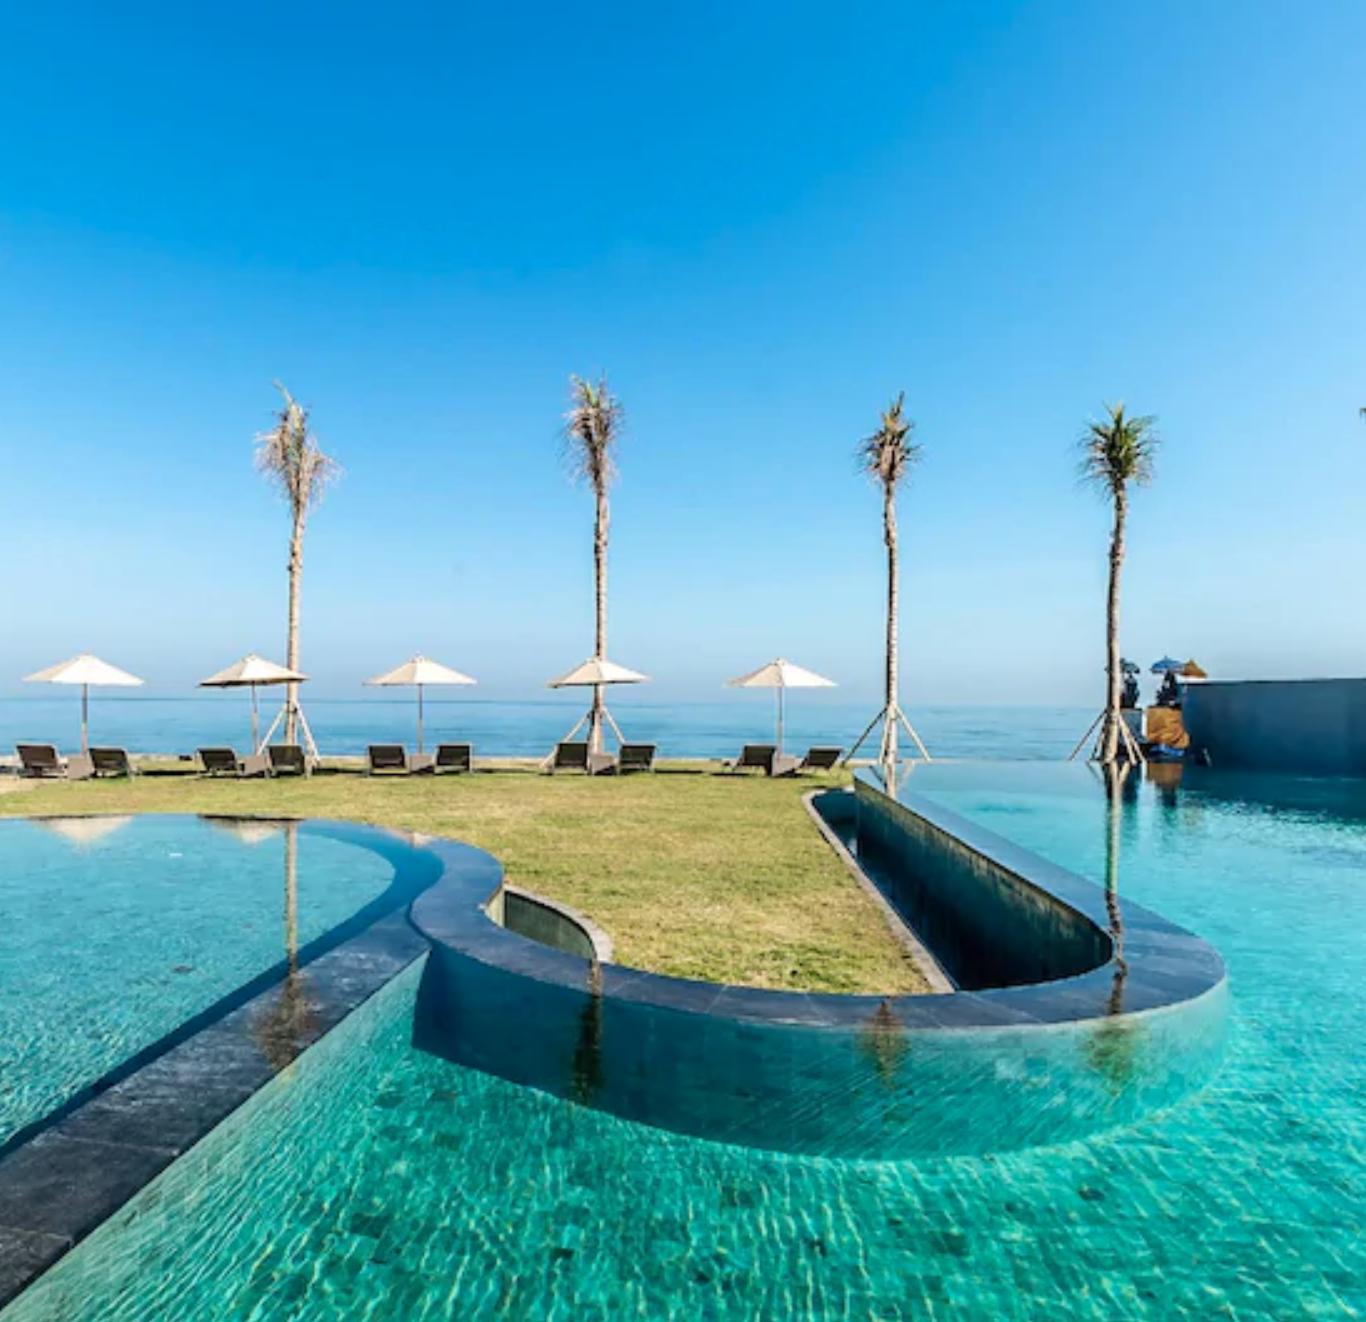 Bali, Indonesien: 1 Woche - 5* Lovina Beach Club and Resort - Doppelzimmer inkl. Früh. / März-Juni 21 / gratis Storno